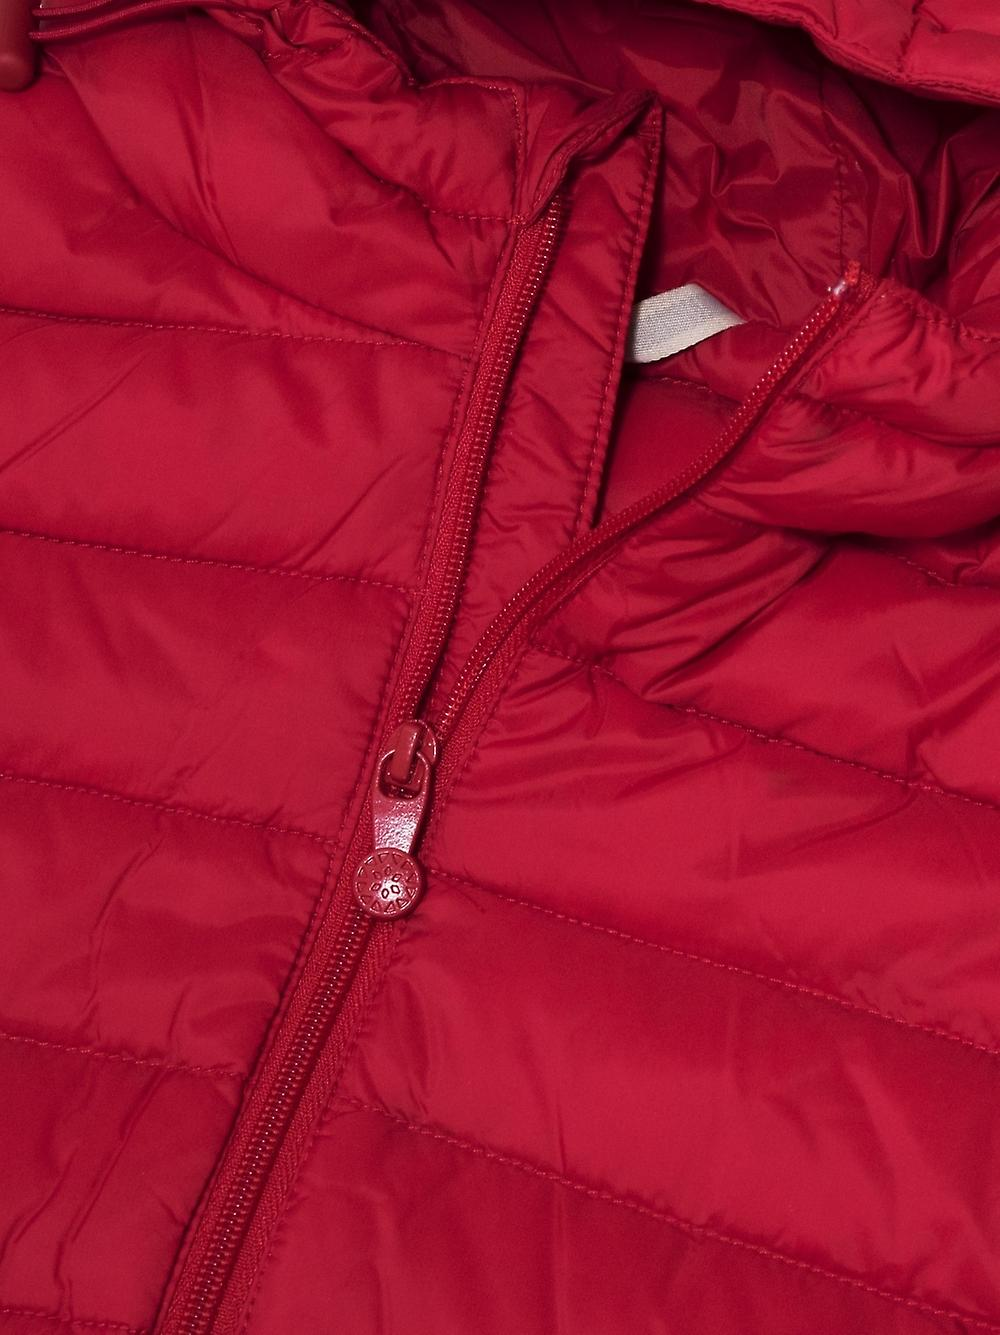 Pyrenex Kids Pyrenex Kids Red Carron Bubble Jacket